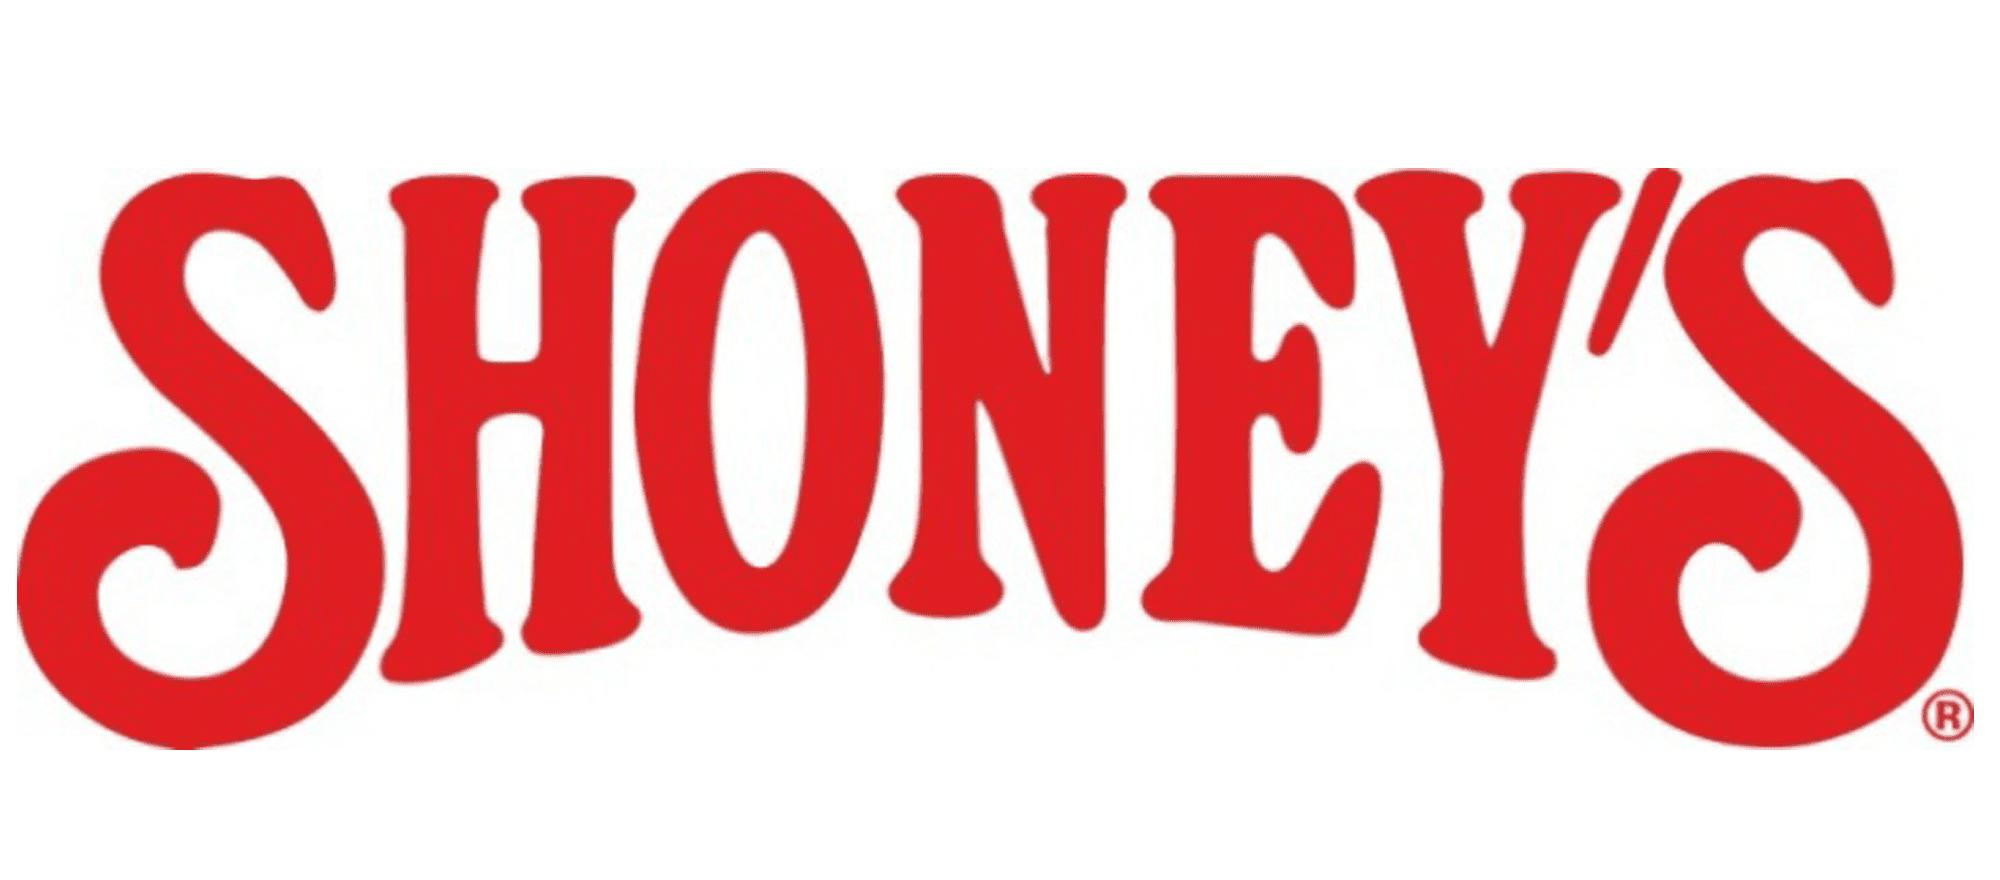 Shoney's logo